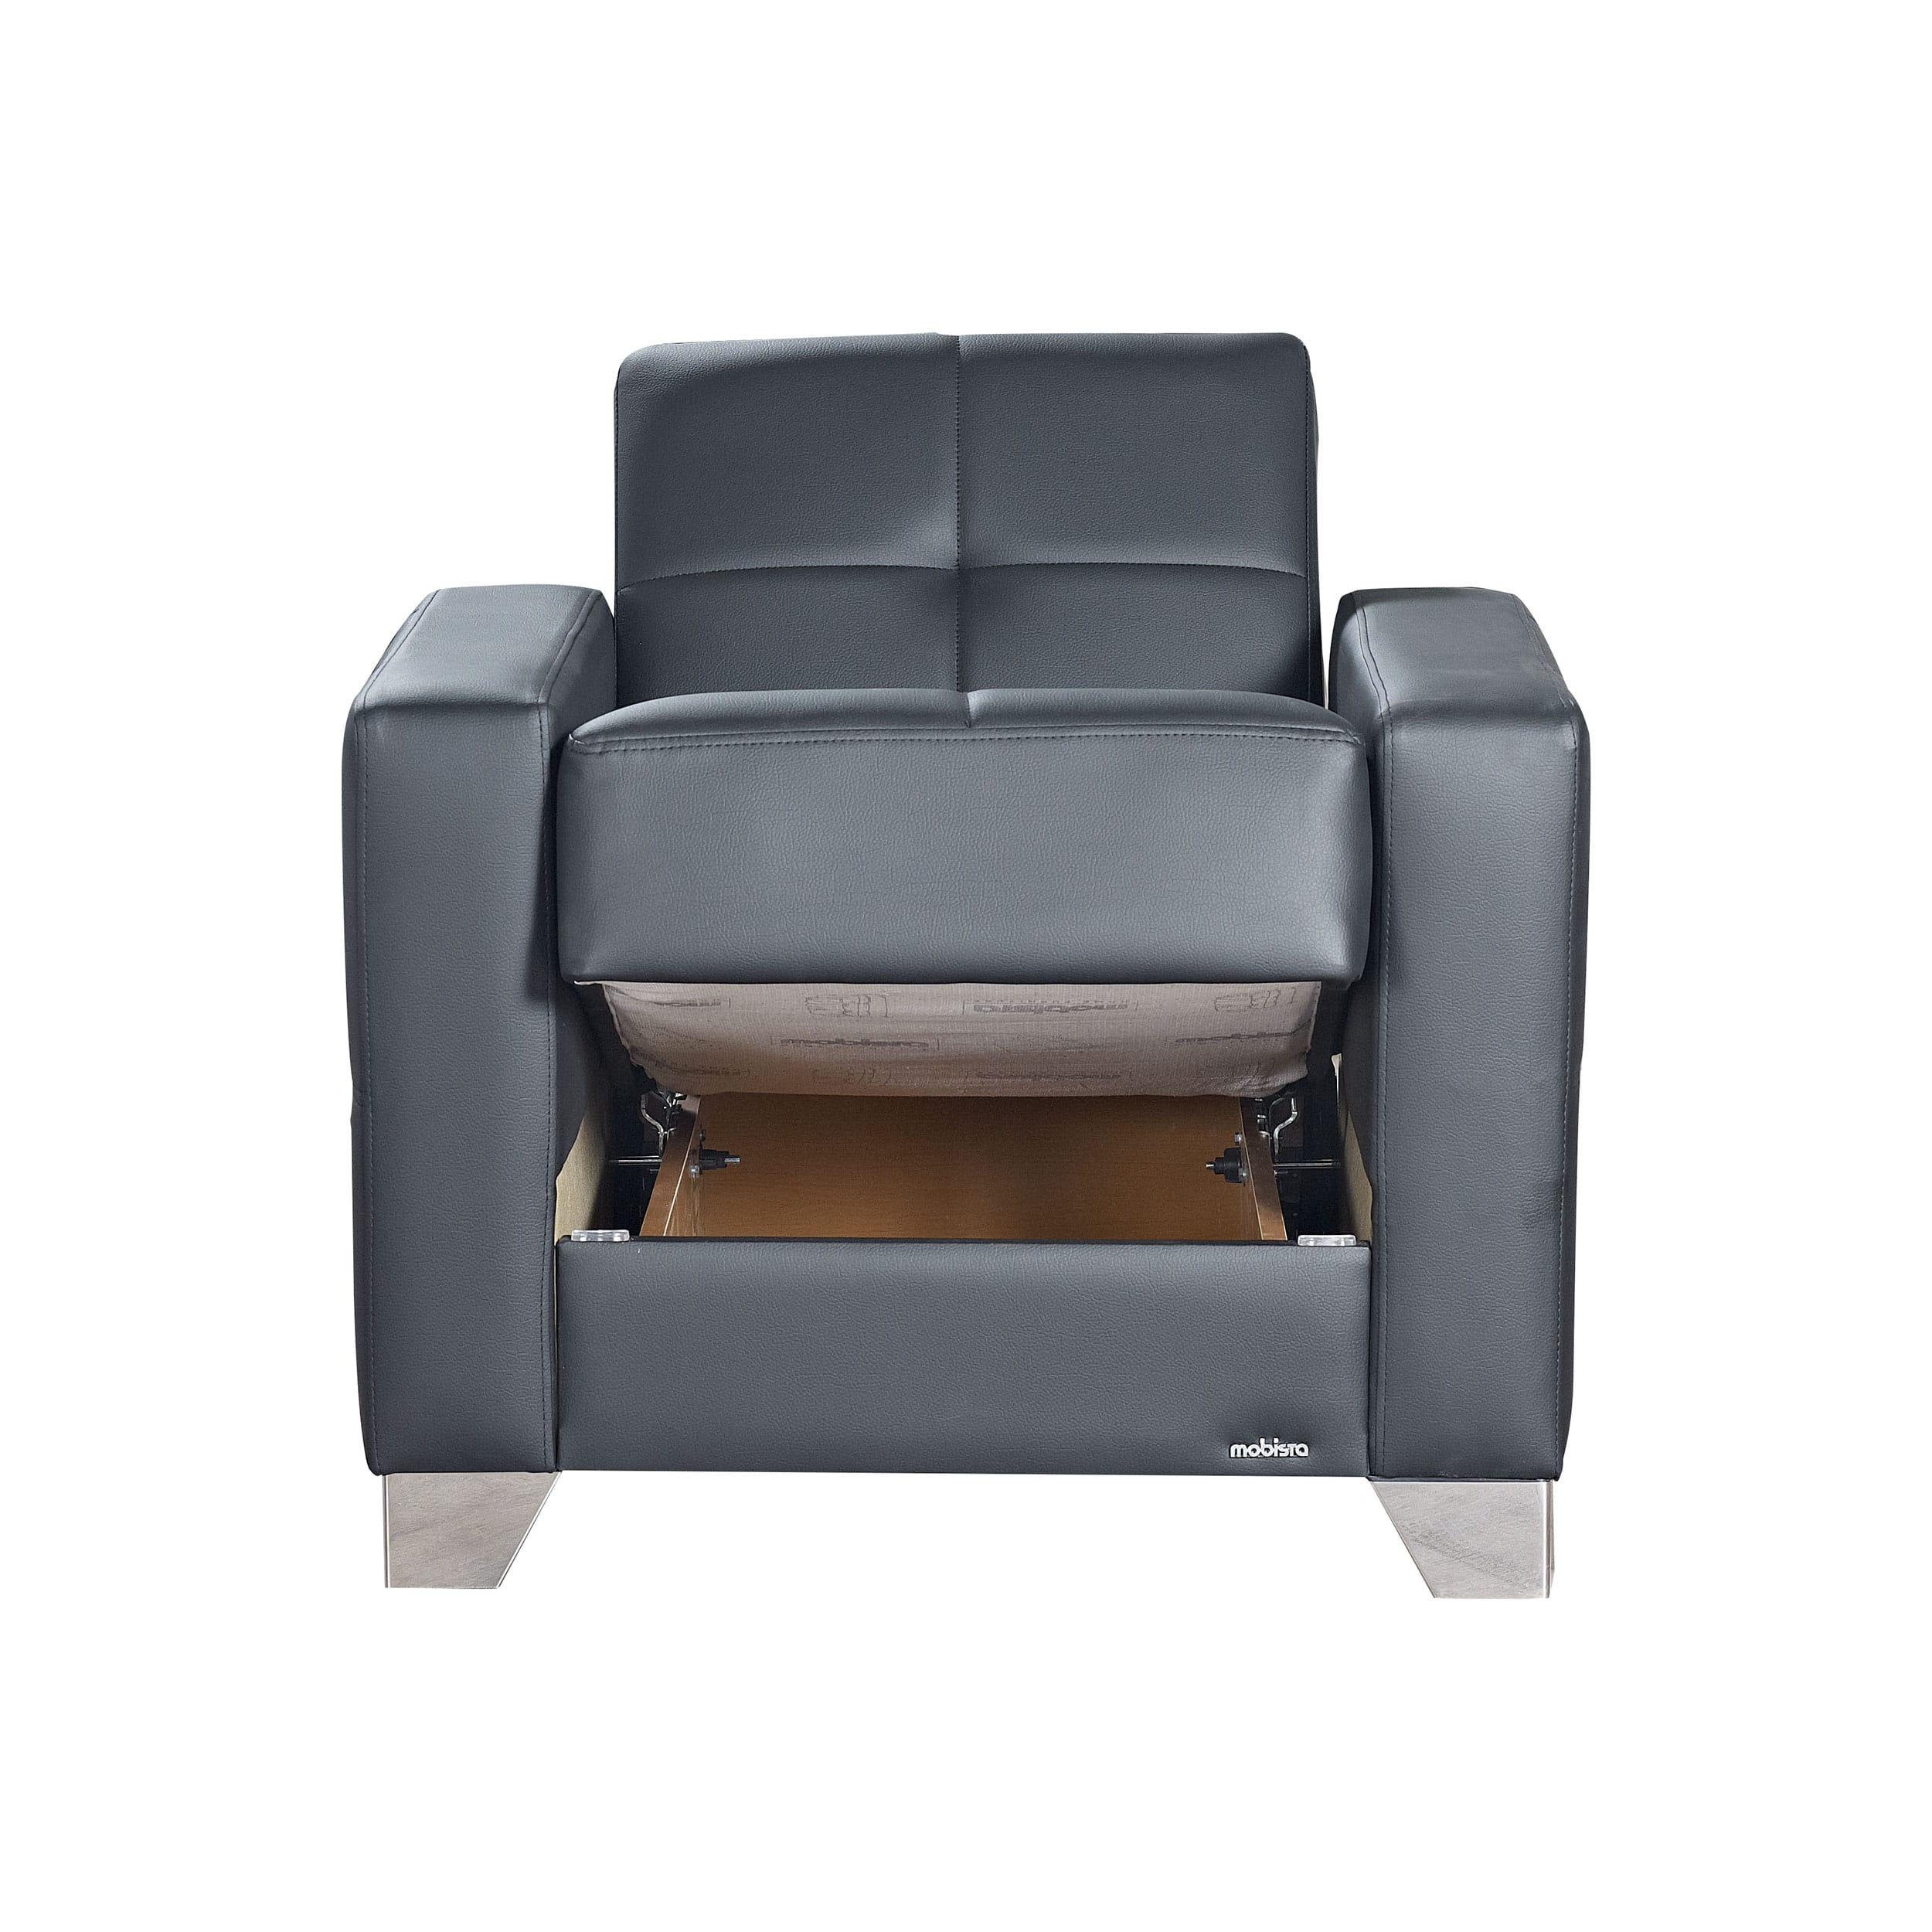 leatherette sofa durability manufacturers bristol viva italia prestige black armchair by mobista